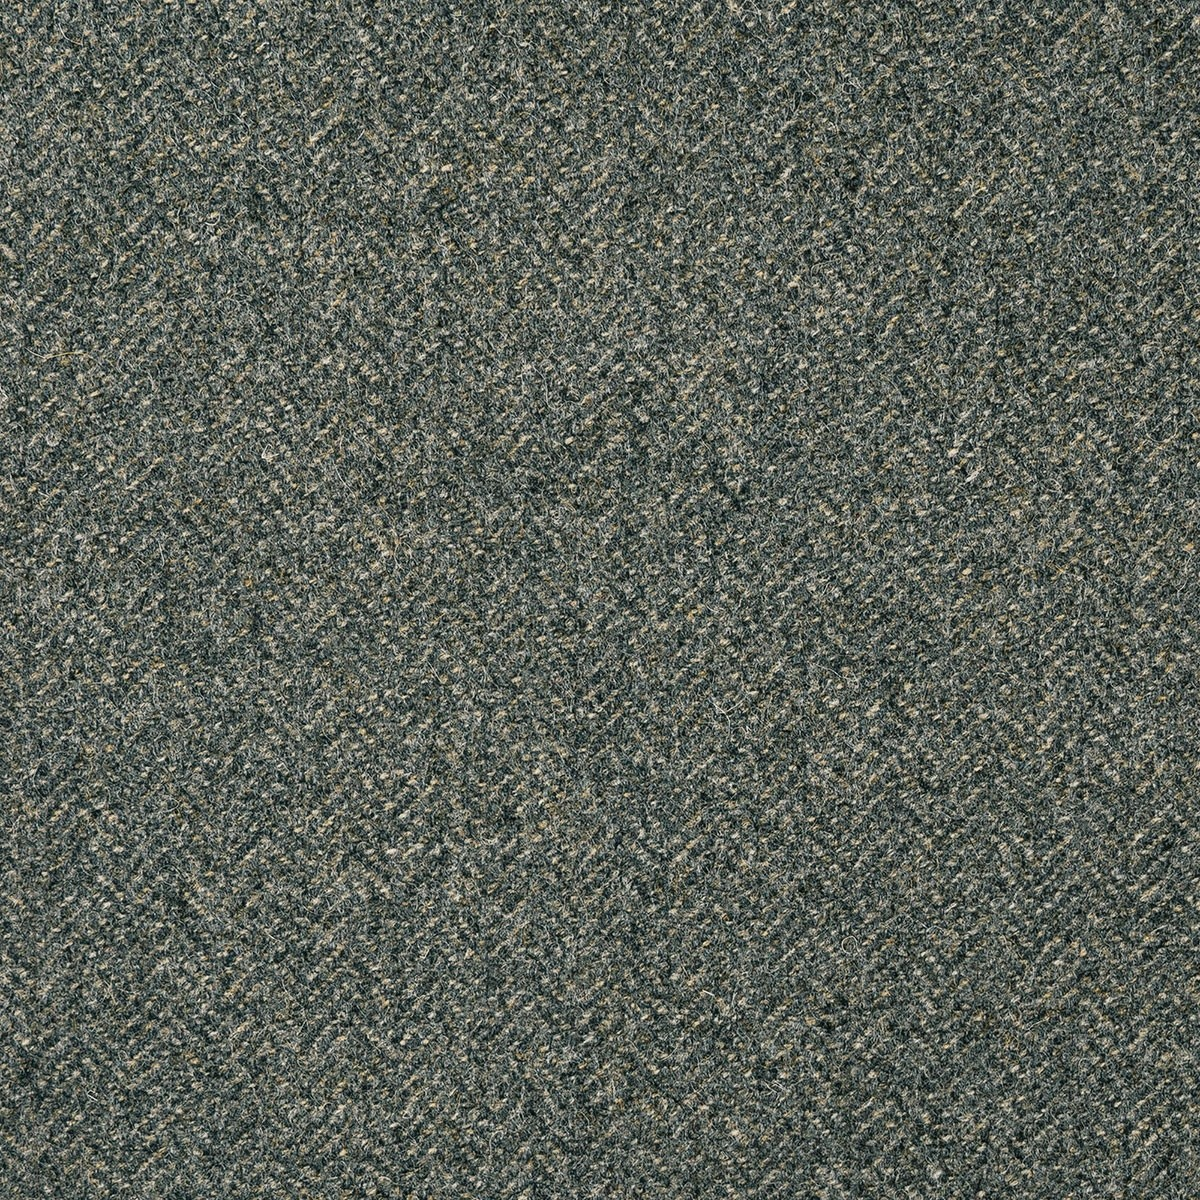 Tay Herringbone Waverley Tweed Fabric